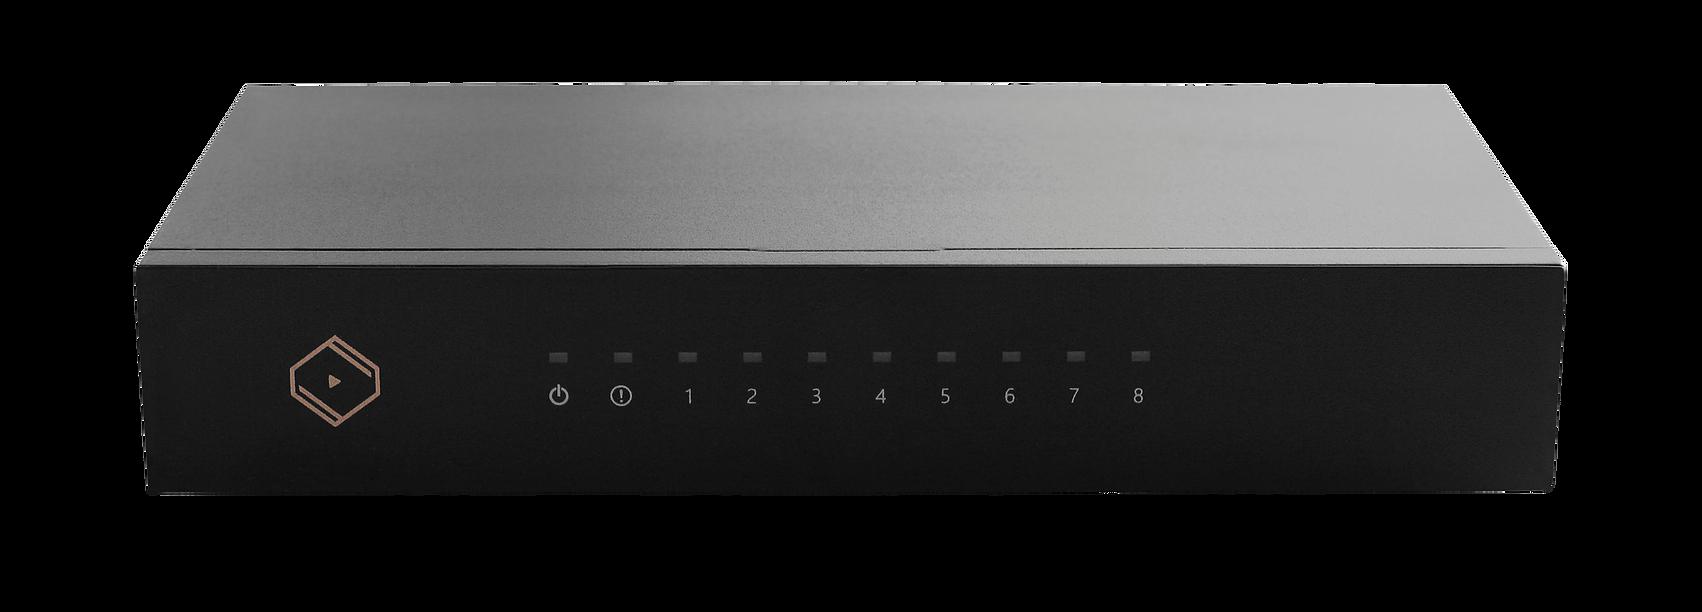 BONN N8 - Silent Angel Hi-Fi Switch